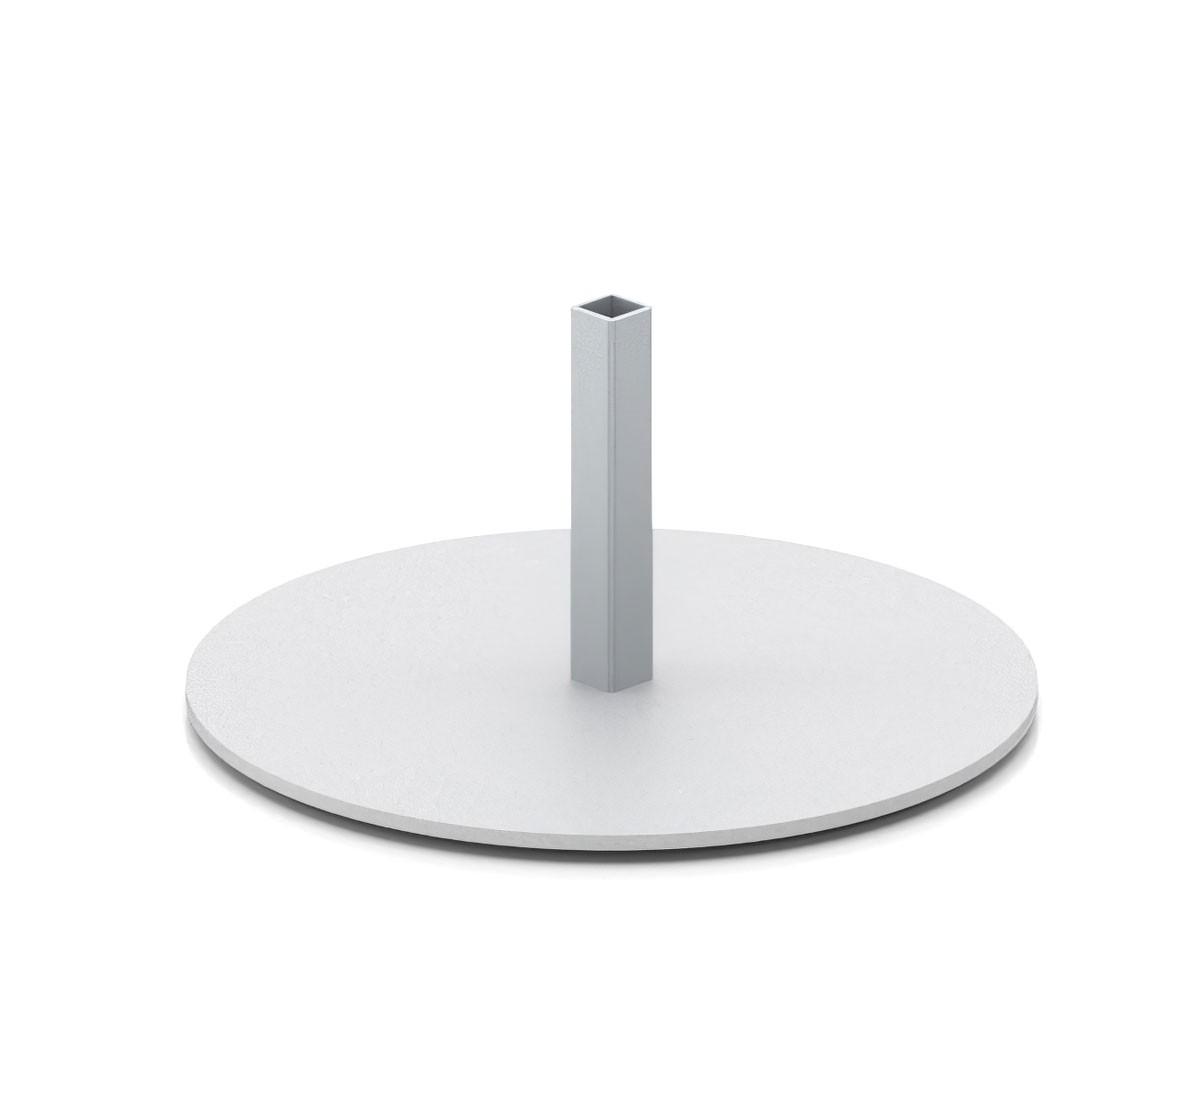 Cashier Shield Round Adhesive Base